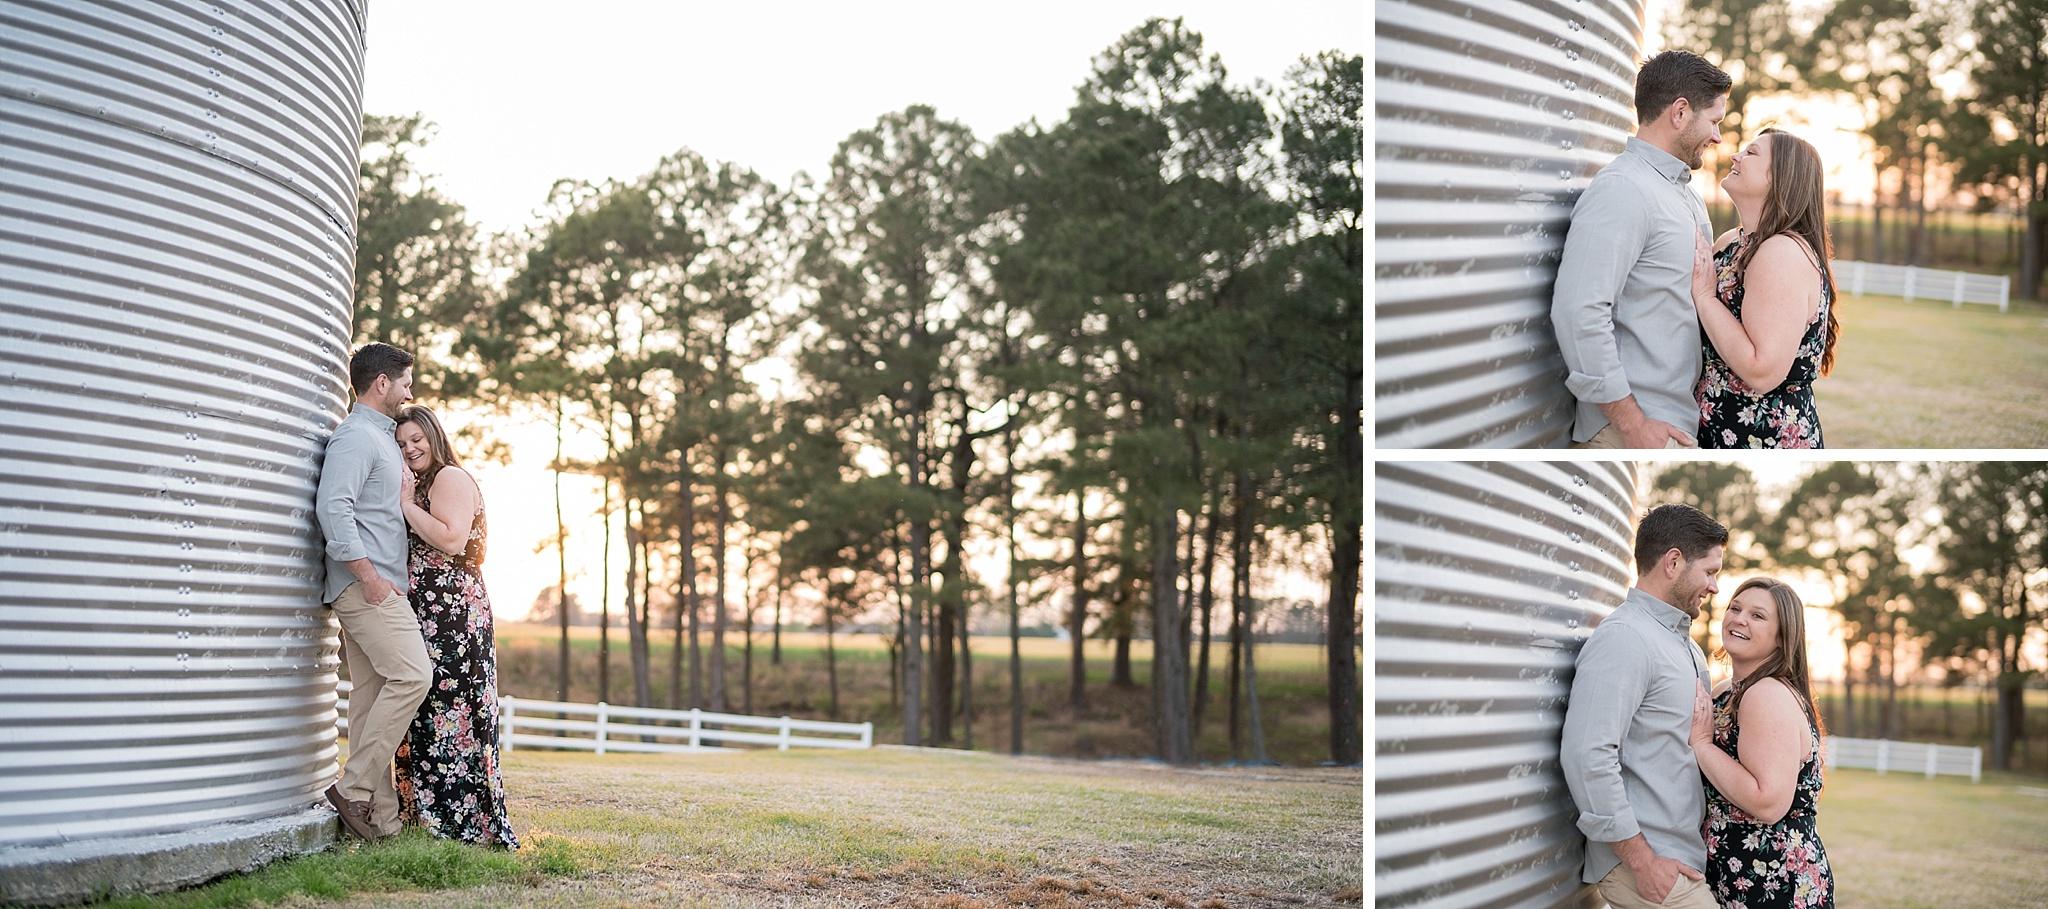 May-Lew-Farm-Farmville-NC-Photographer-078.jpg